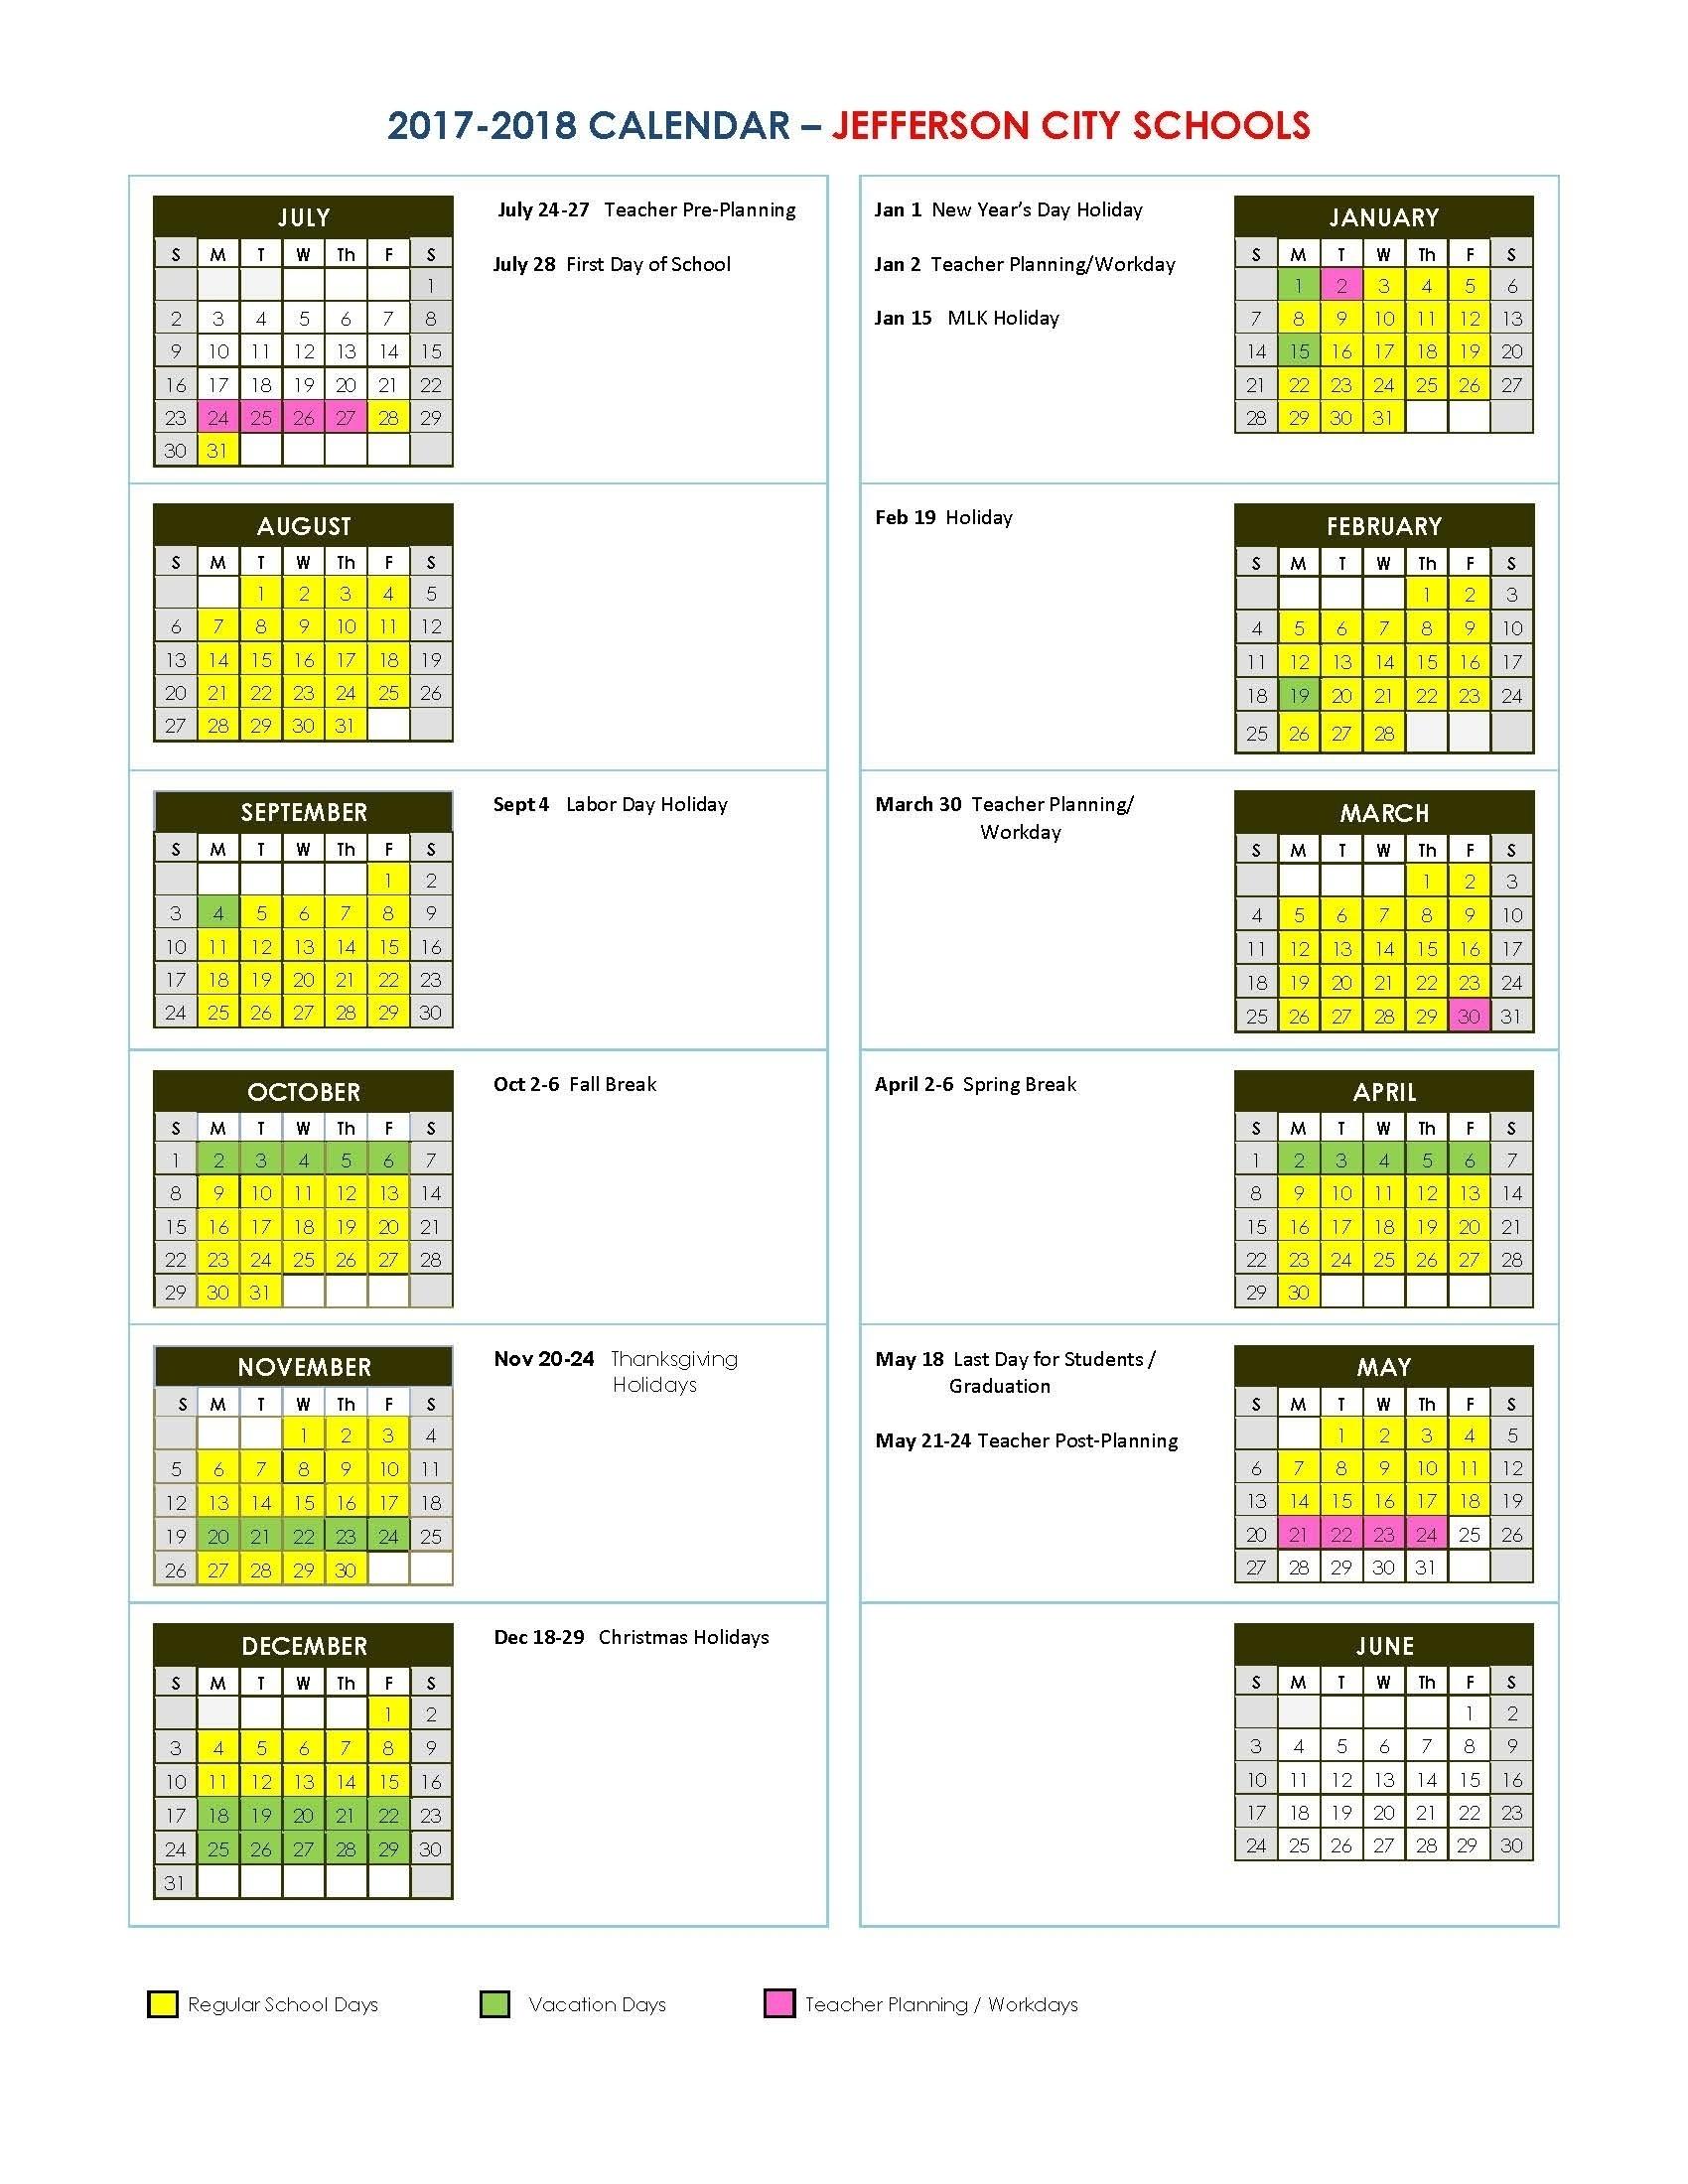 Incredible School Calendar Jefferson County Alabama • Printable_School Calendar Jefferson County Alabama